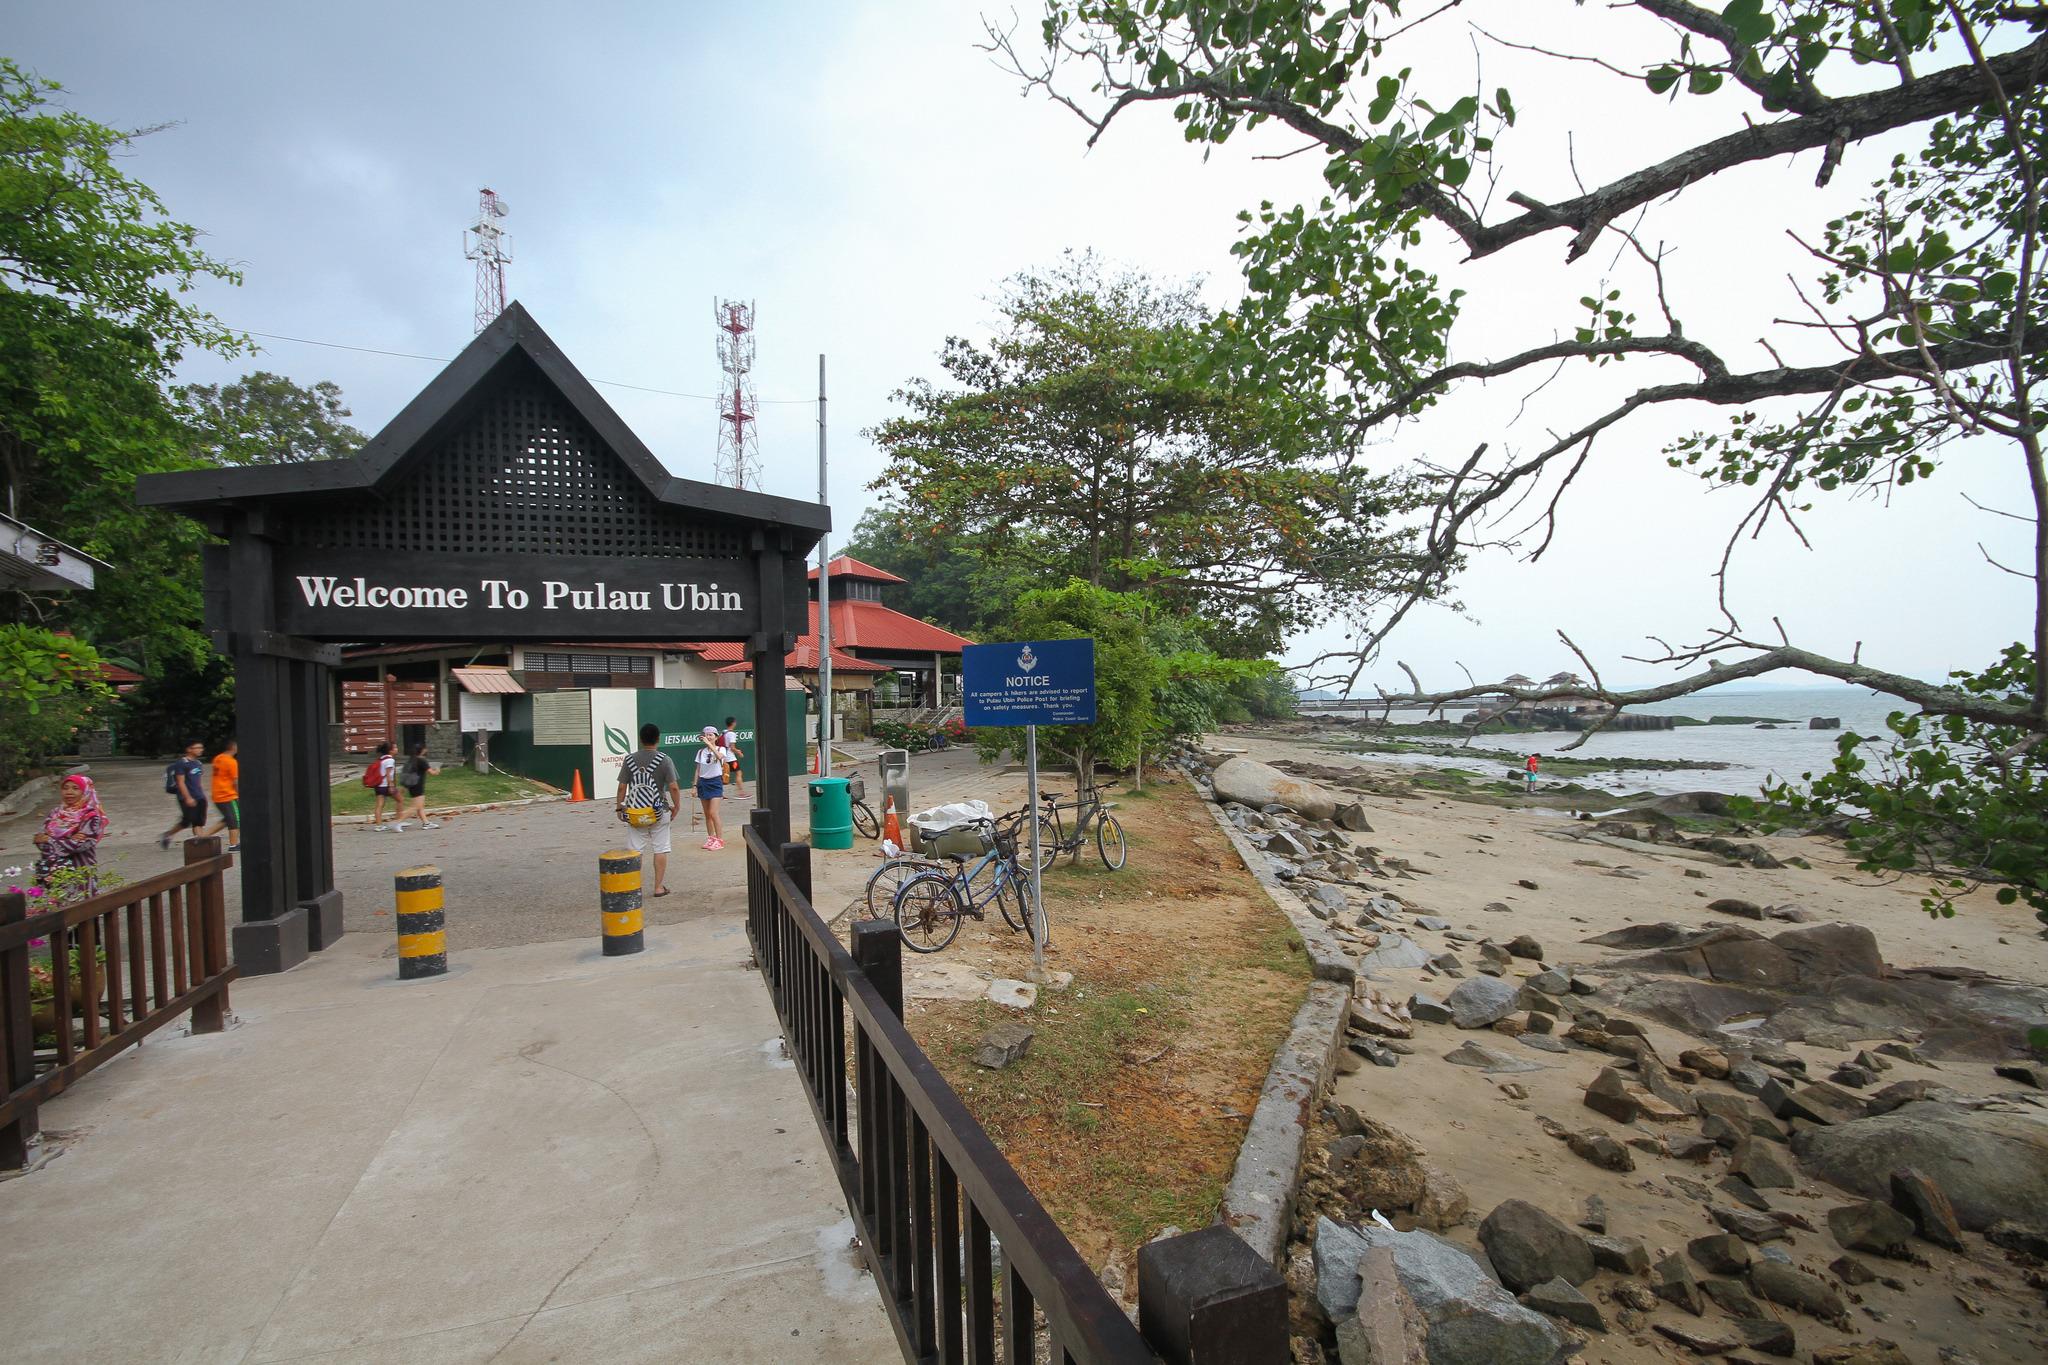 Guide to Pulau Ubin